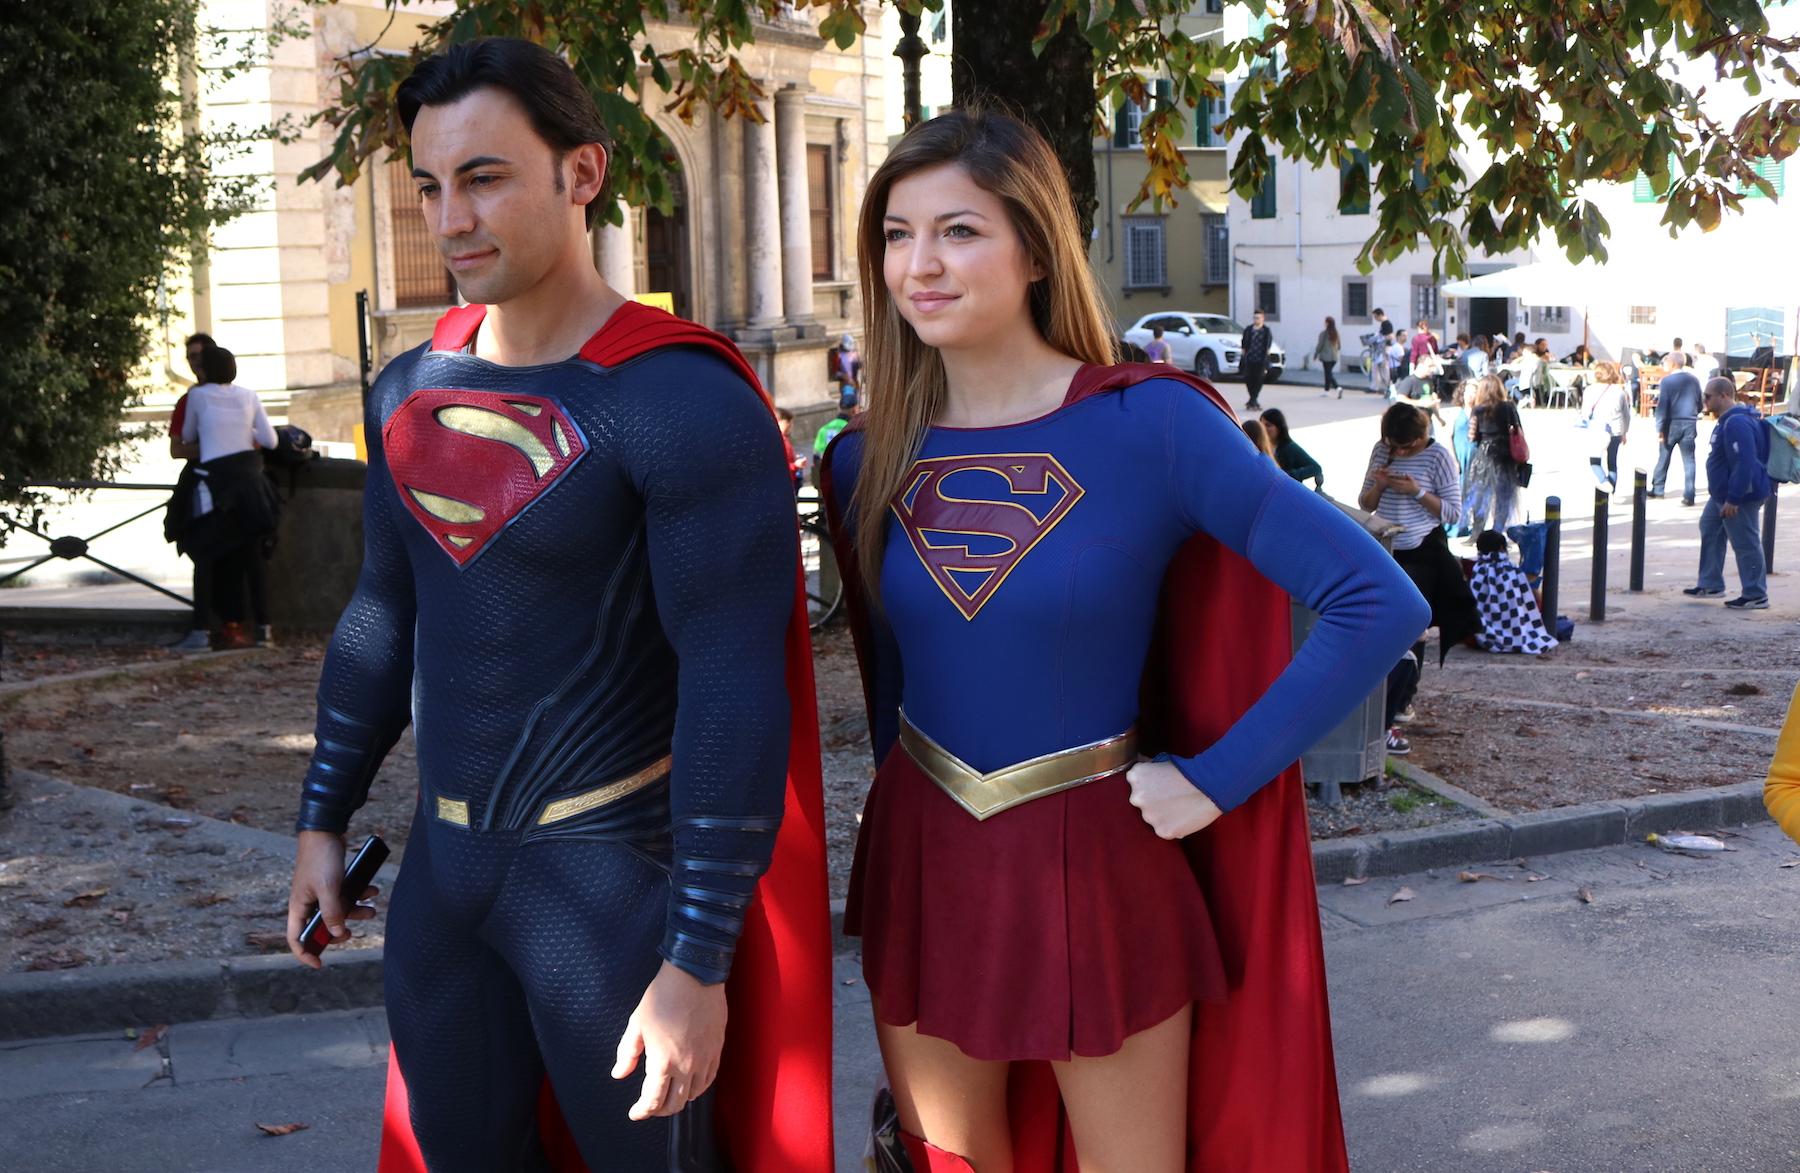 Lucca 2016: cosplay di superman e supergirl